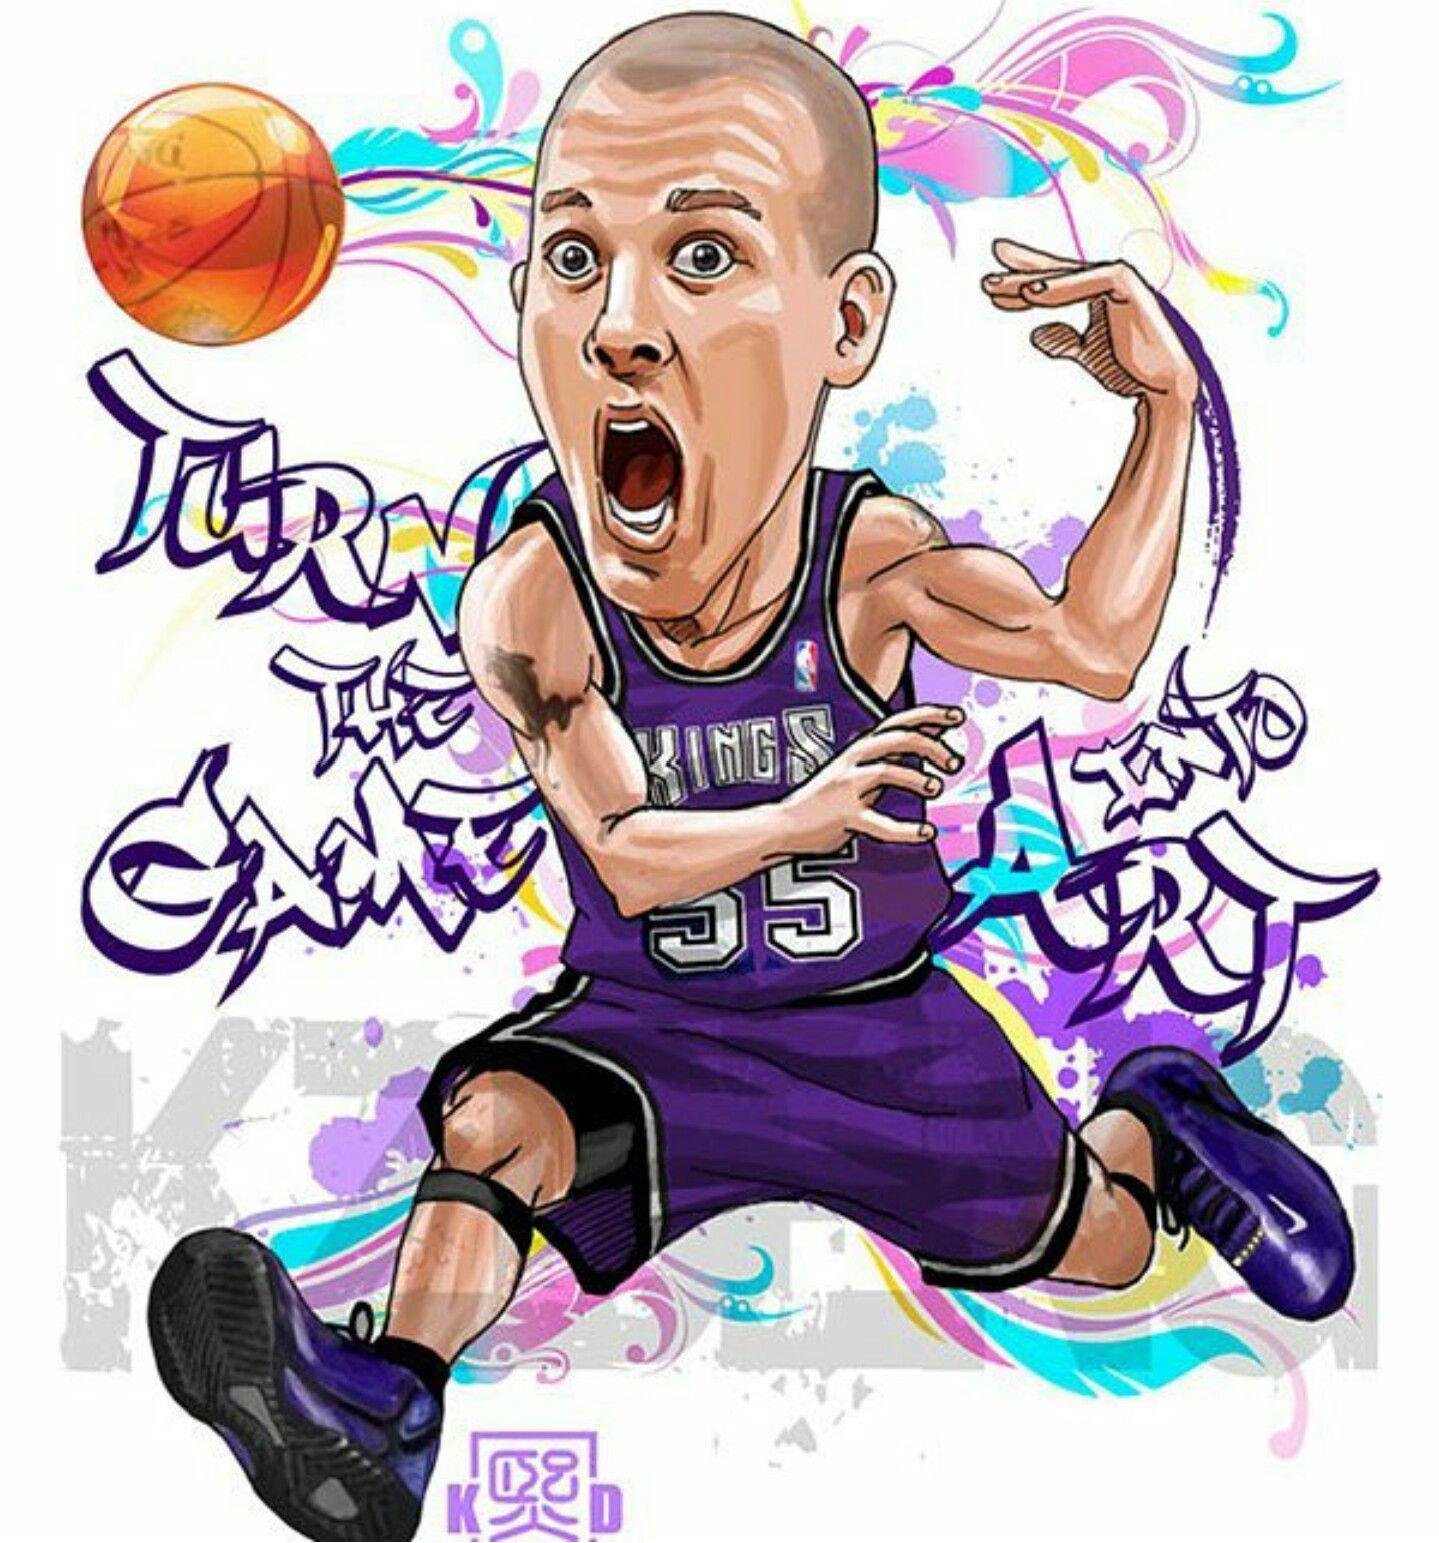 Pin by Al Hughes on Basketball Art   Pinterest   Basketball art